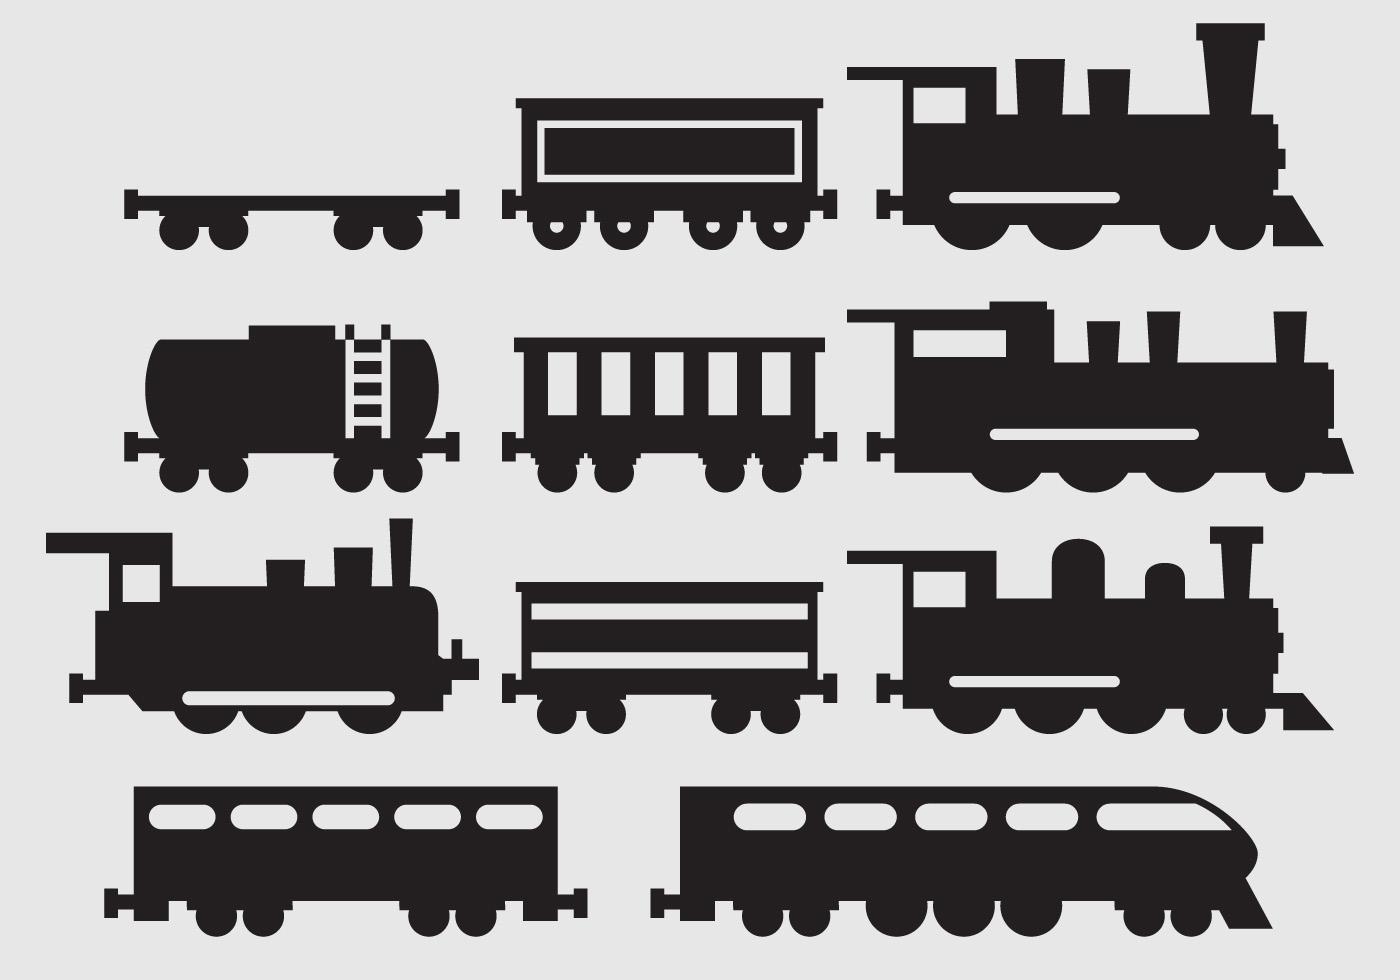 train silhouette vectors download free vector art  stock train track clipart images train track clipart free